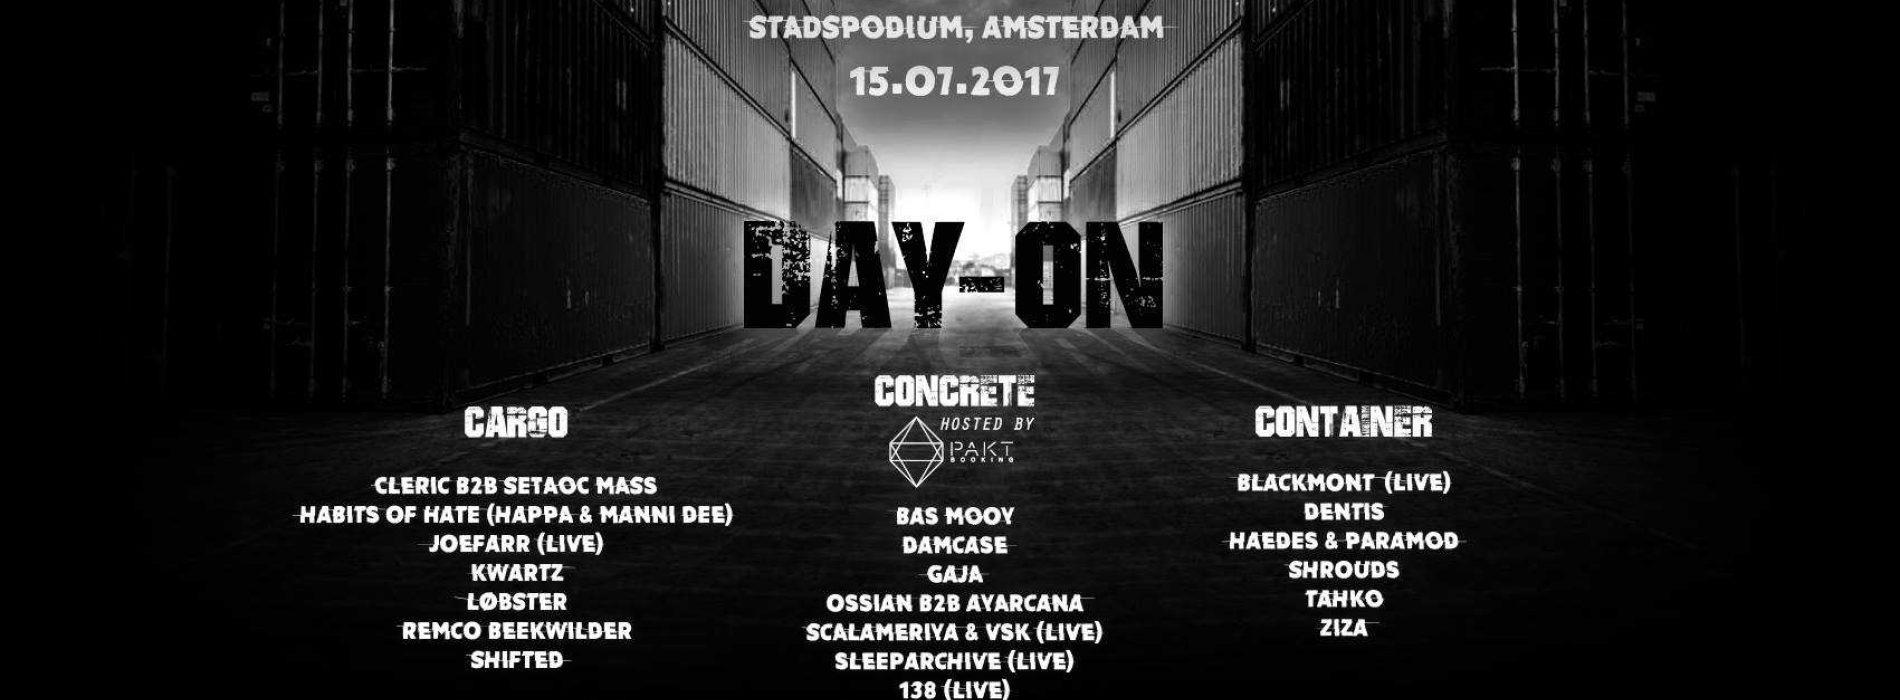 Day-On | Stadspodium Amsterdam